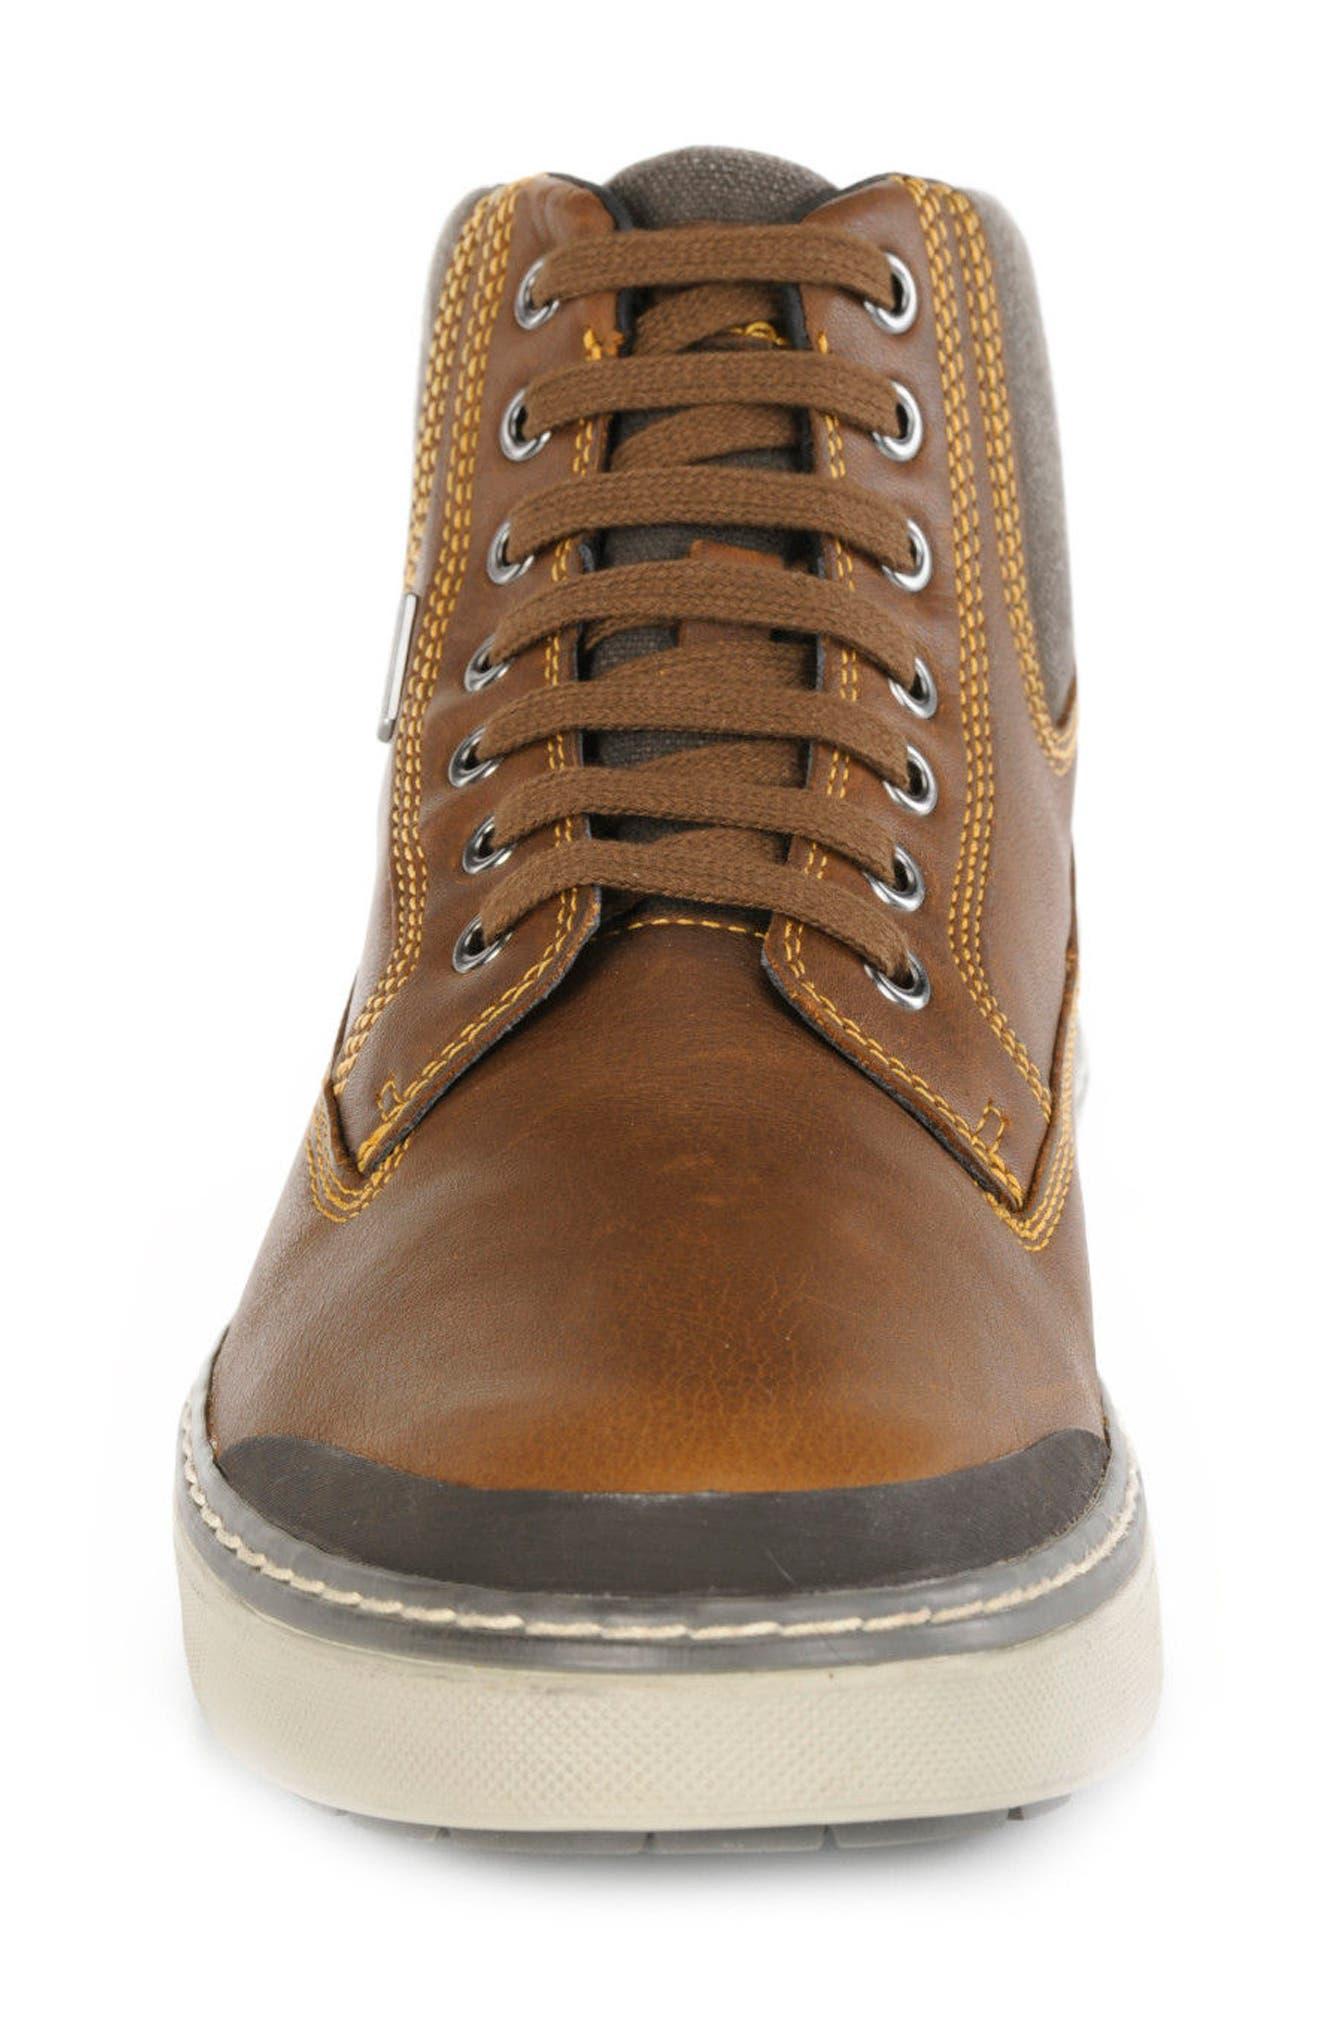 Mattias Amphibiox Waterproof Leather Sneaker,                             Alternate thumbnail 4, color,                             Brown/ Brown